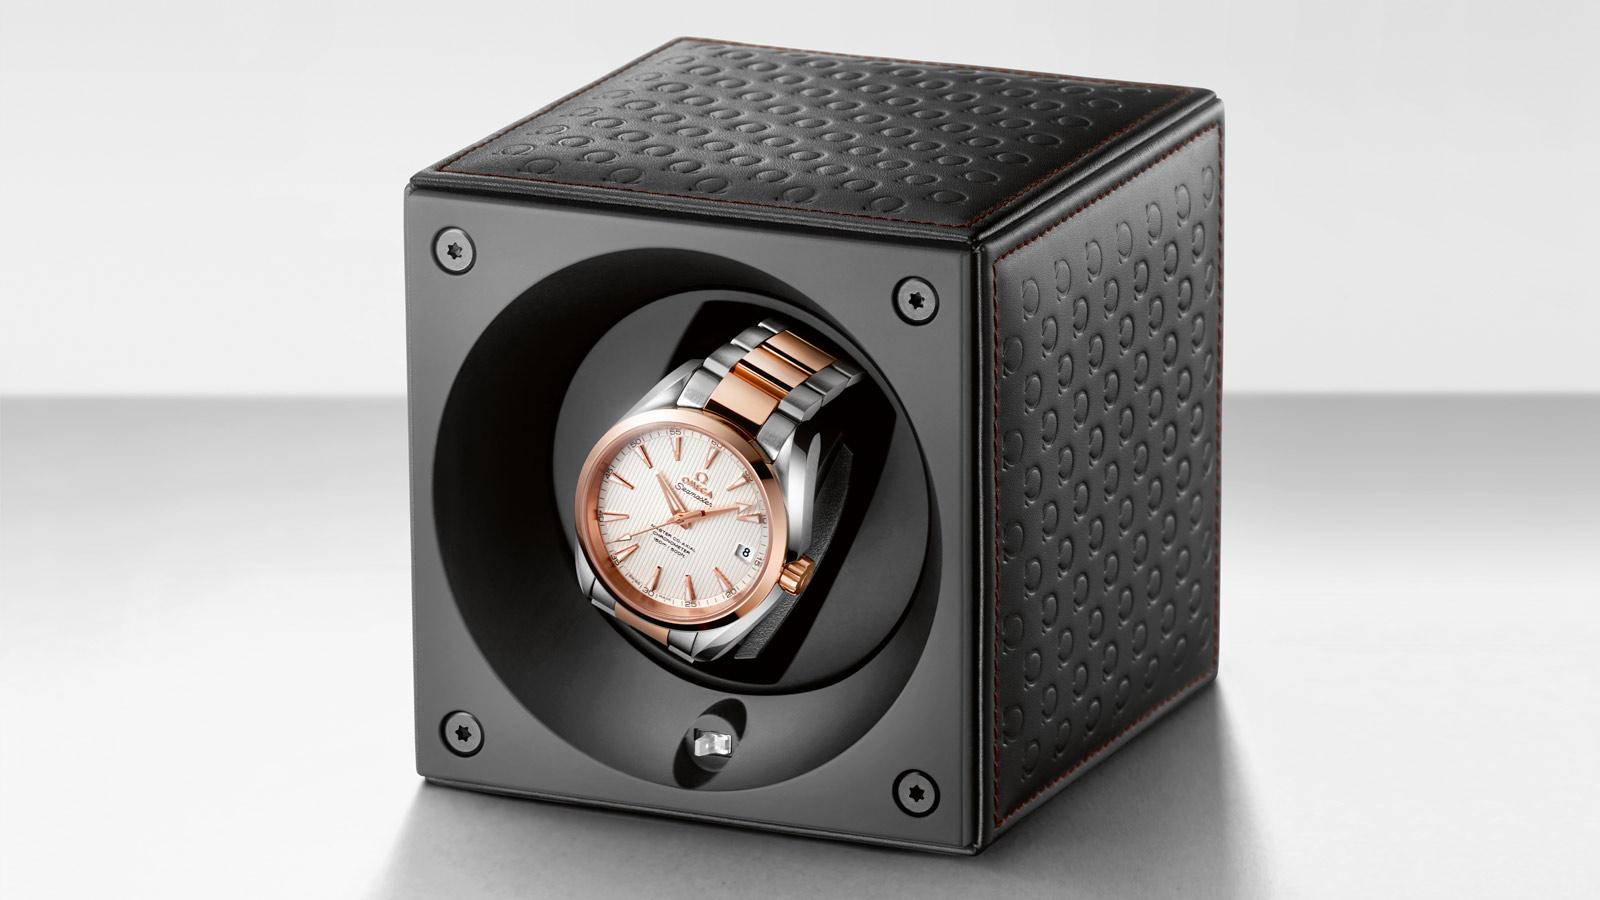 hộp xoay đồng hồ cơ 1 ngăn cao cấp giá rẻ tphcm